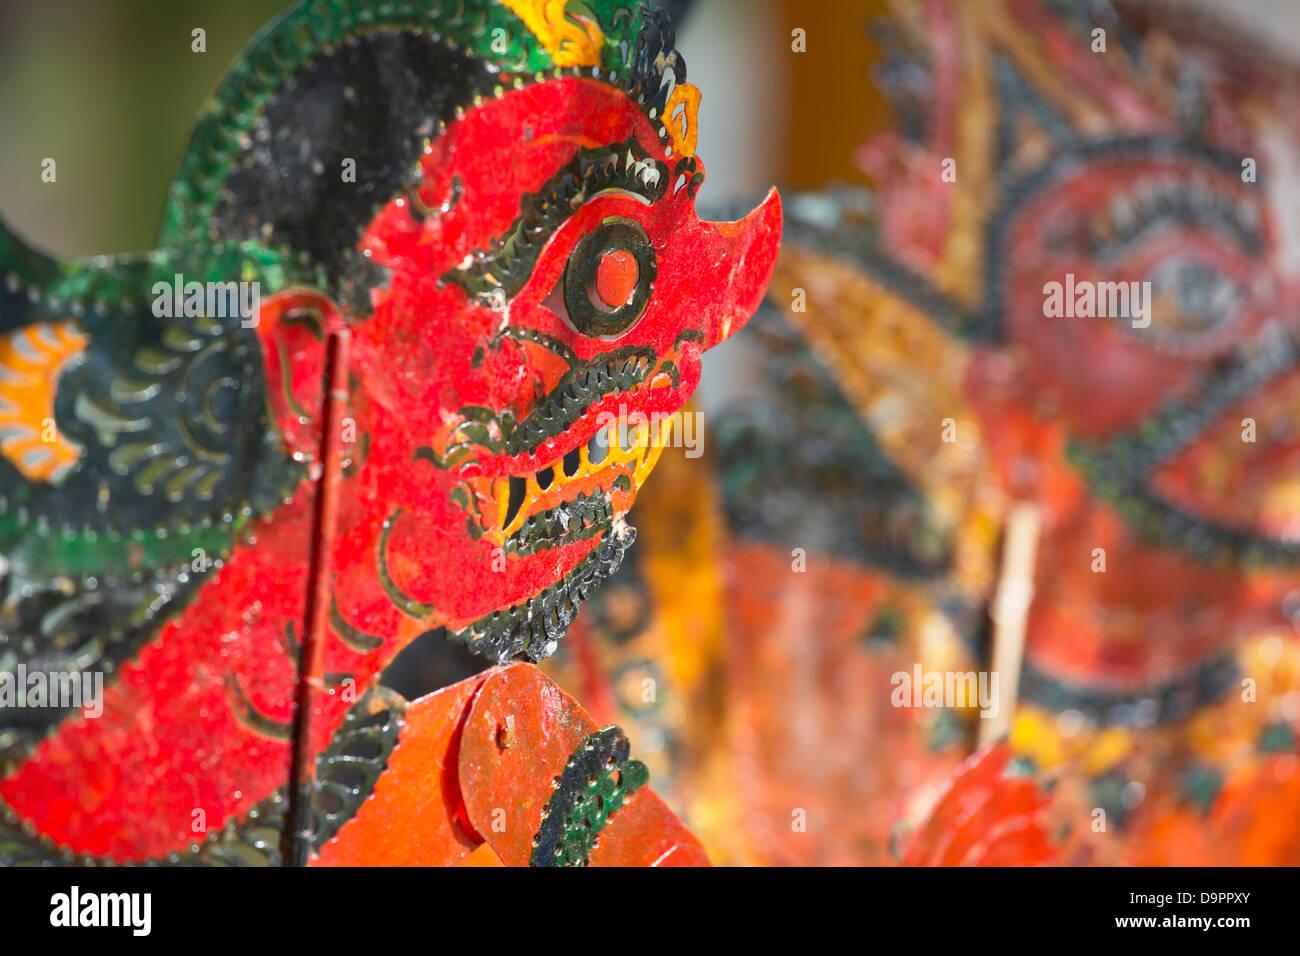 Malaysian shadow puppets, Kota Bharu, Kelantan, Malaysia - Stock Image